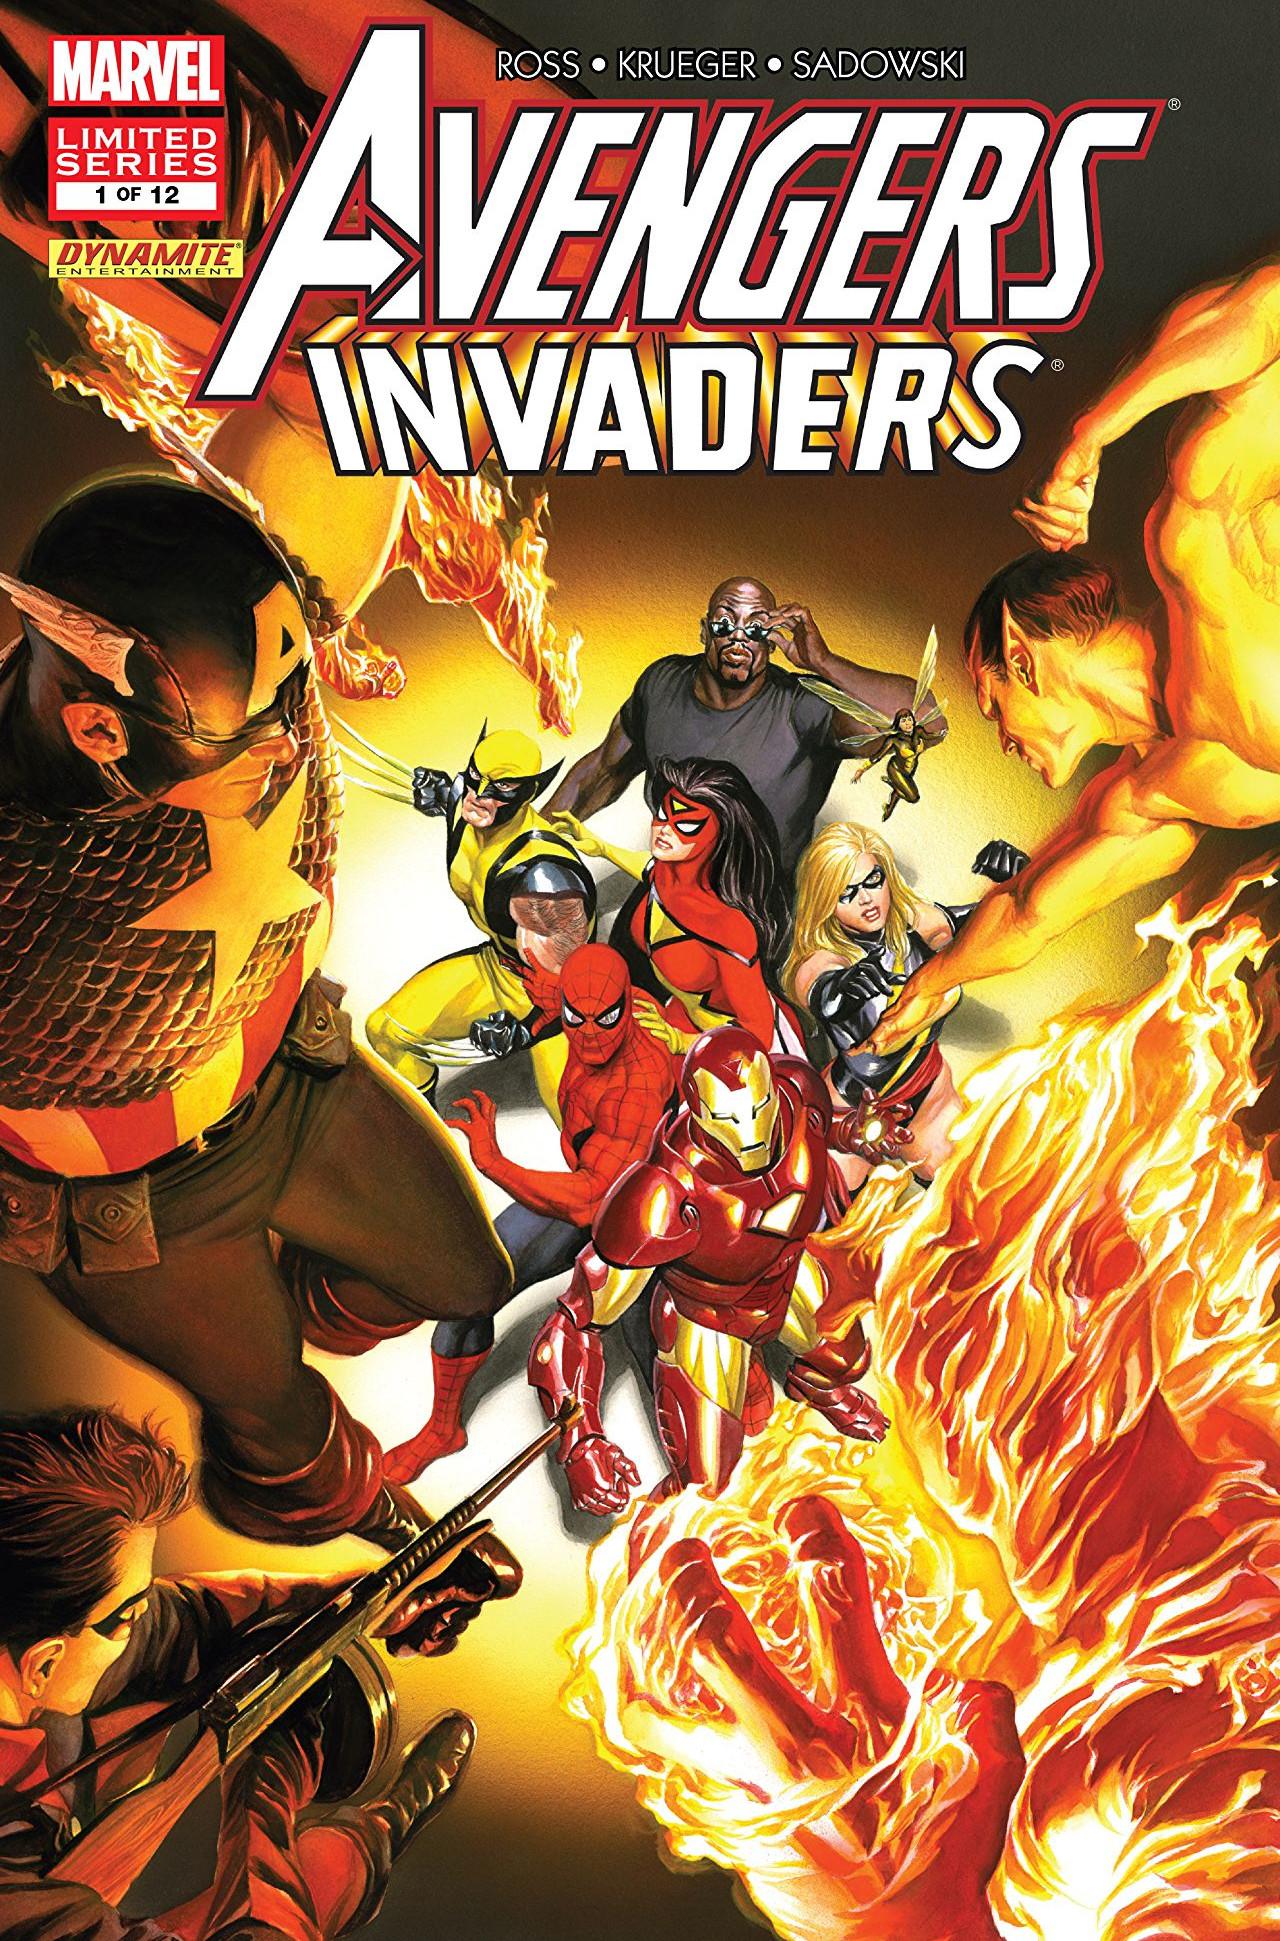 Avengers Invaders Vol 1 1